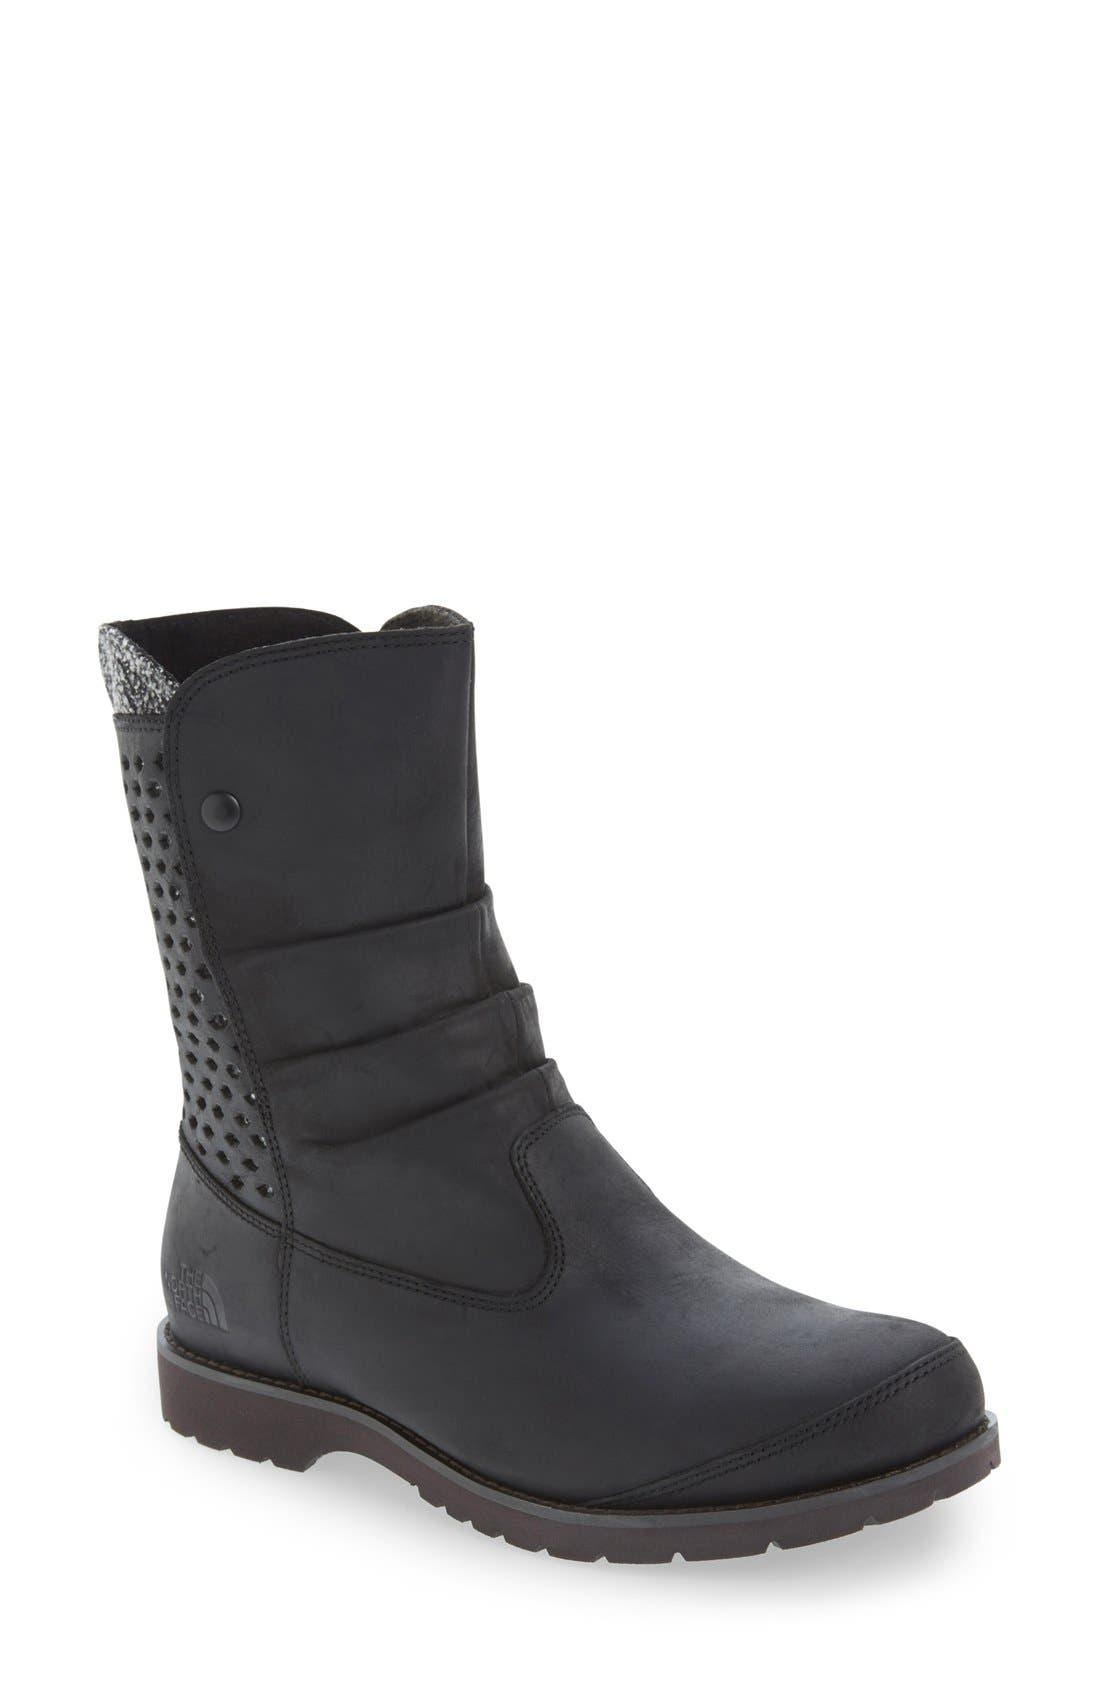 Main Image - The North Face 'Ballard' Pull-On Boot (Women)